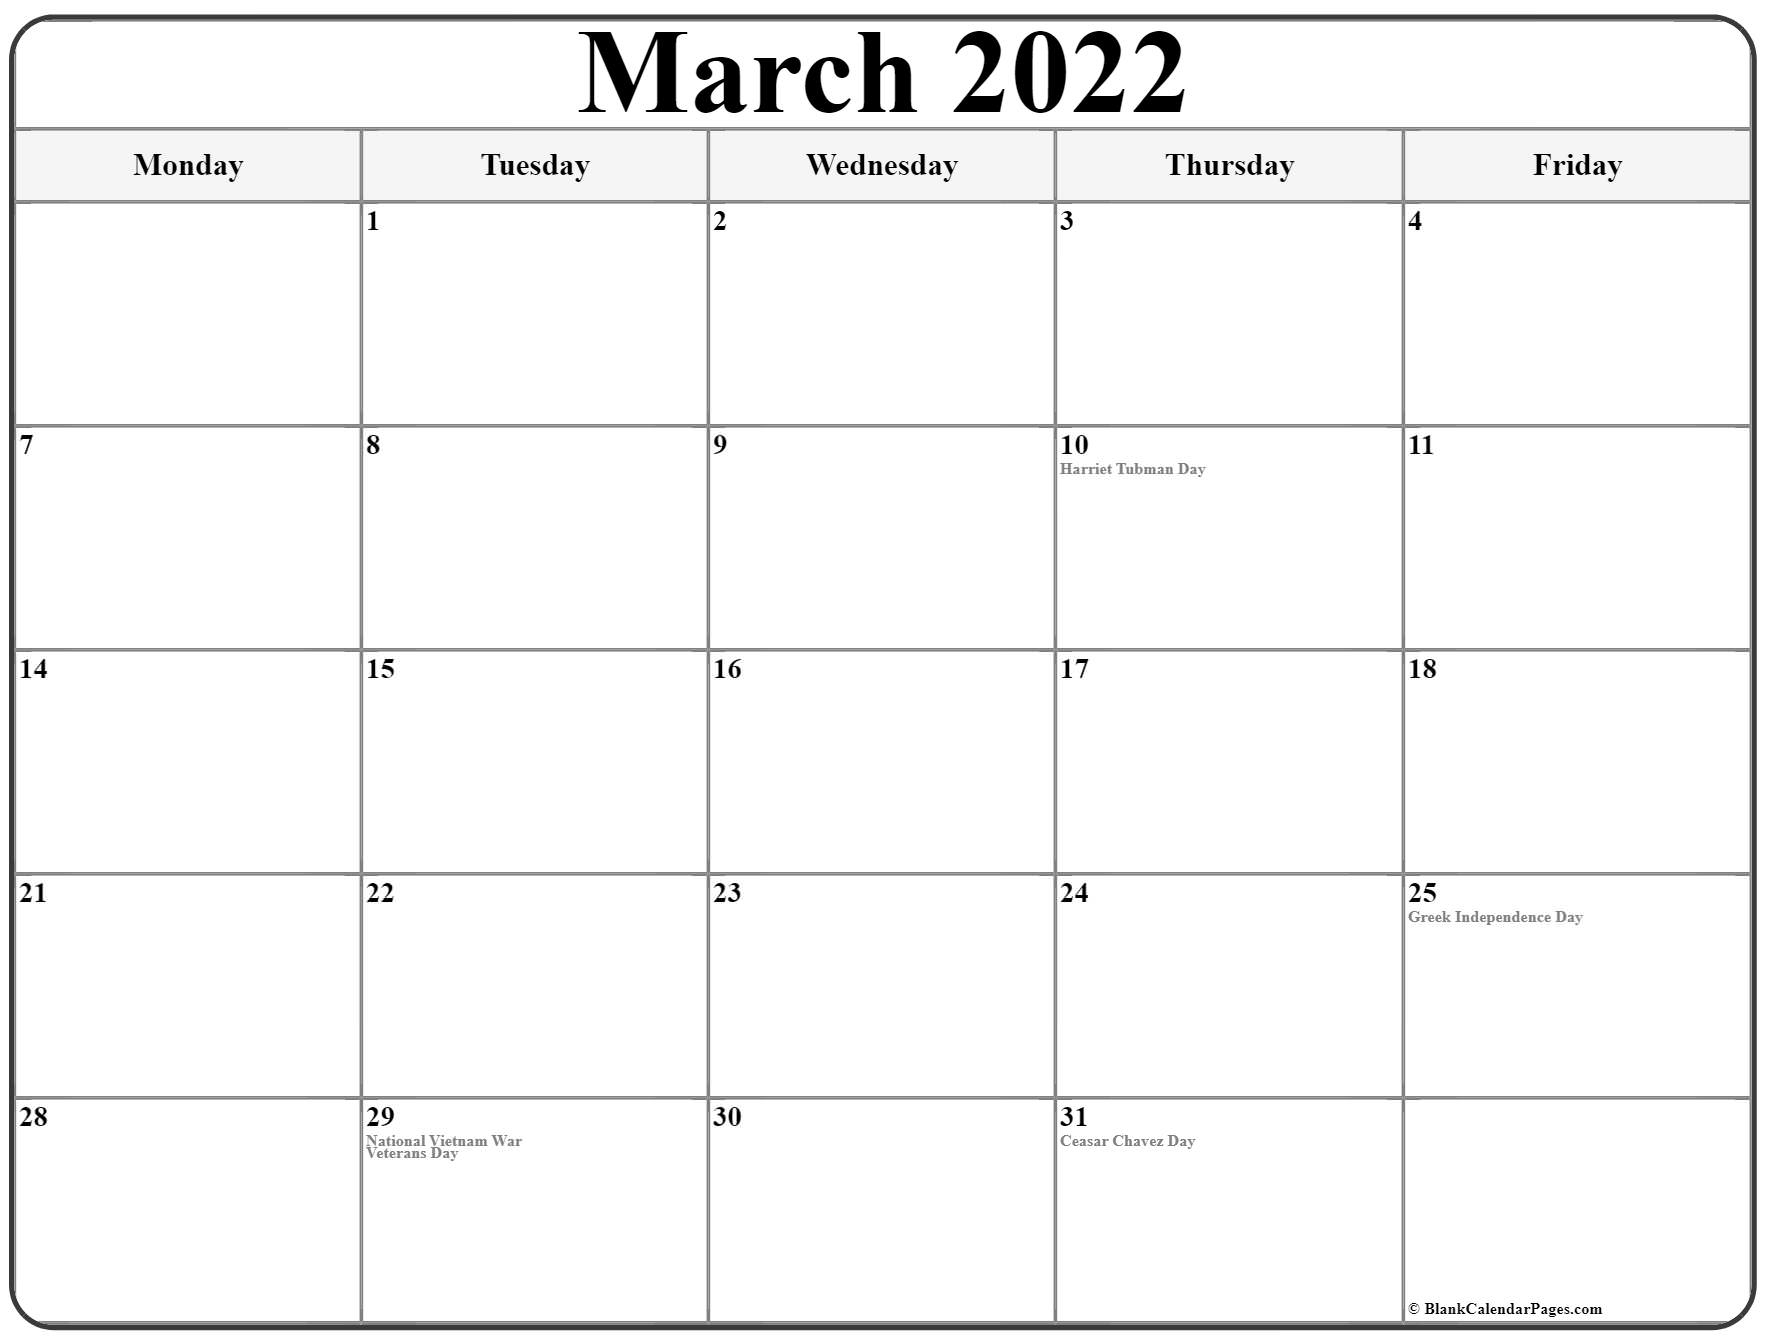 March 2022 Monday Calendar | Monday To Sunday In 2022 Calendar Feb March April